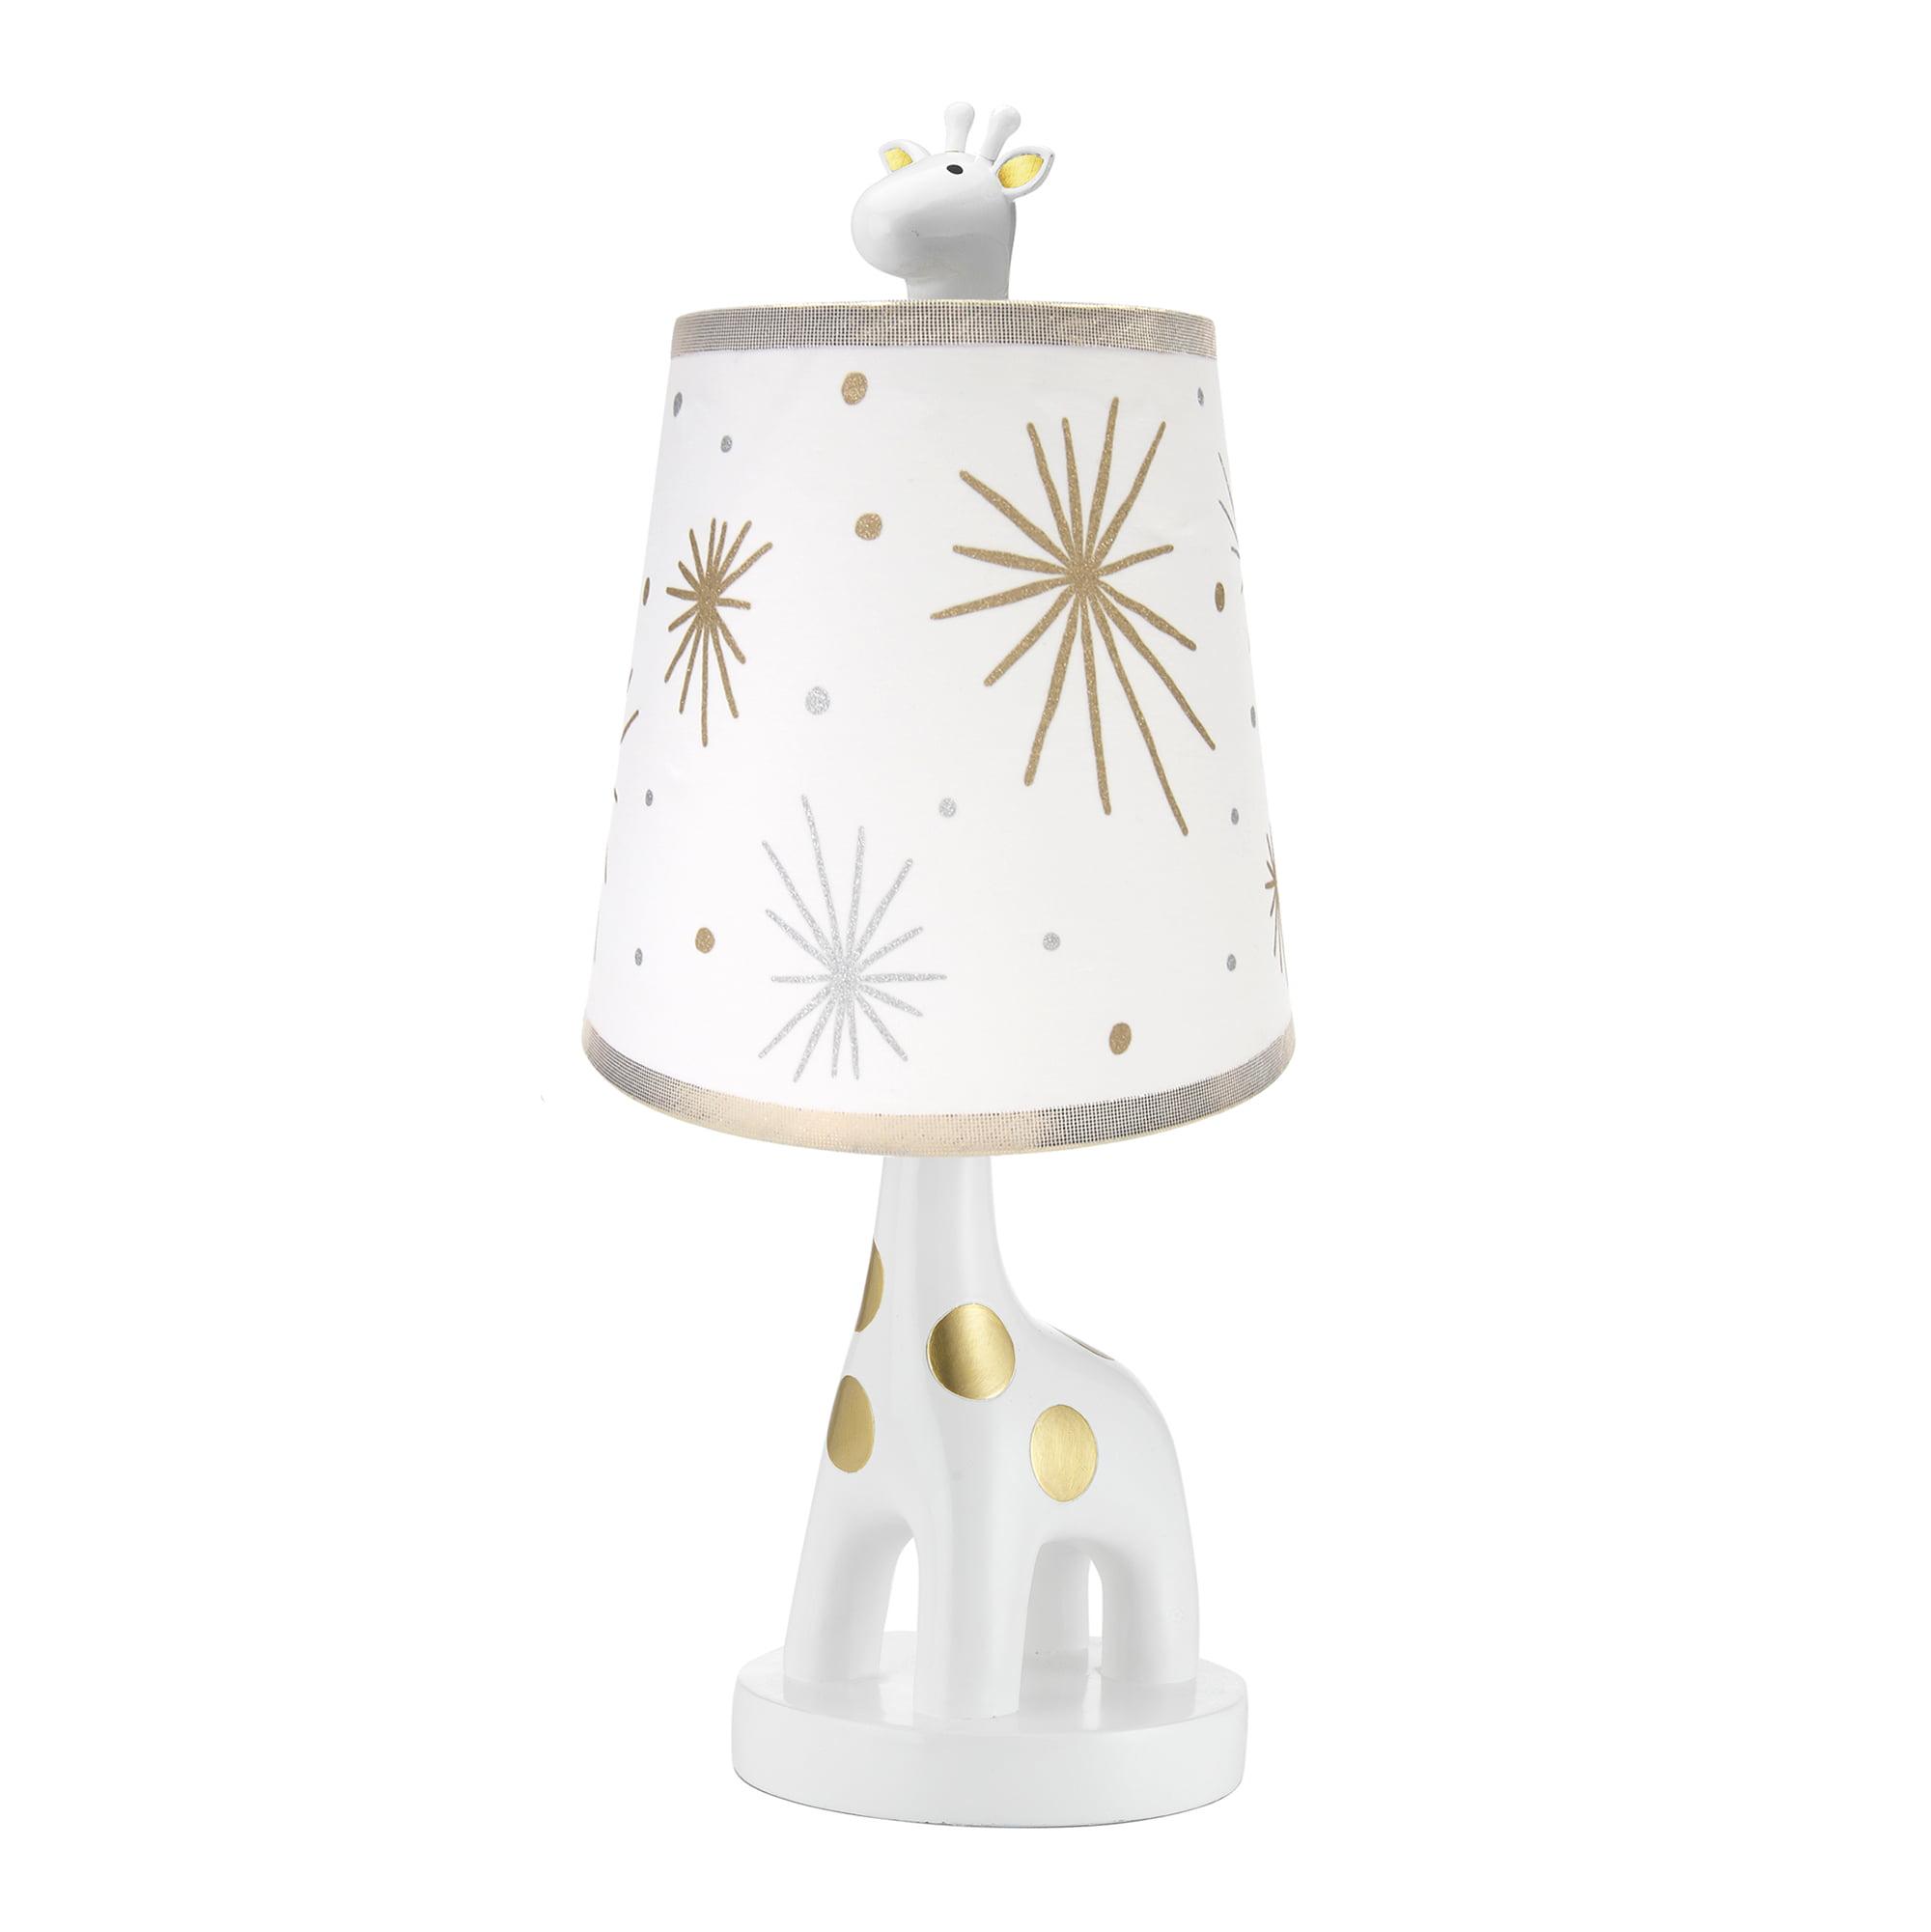 Lambs & Ivy Signature Moonbeams Lamp with Shade & Bulb Gold, White, Animals by Lambs & Ivy